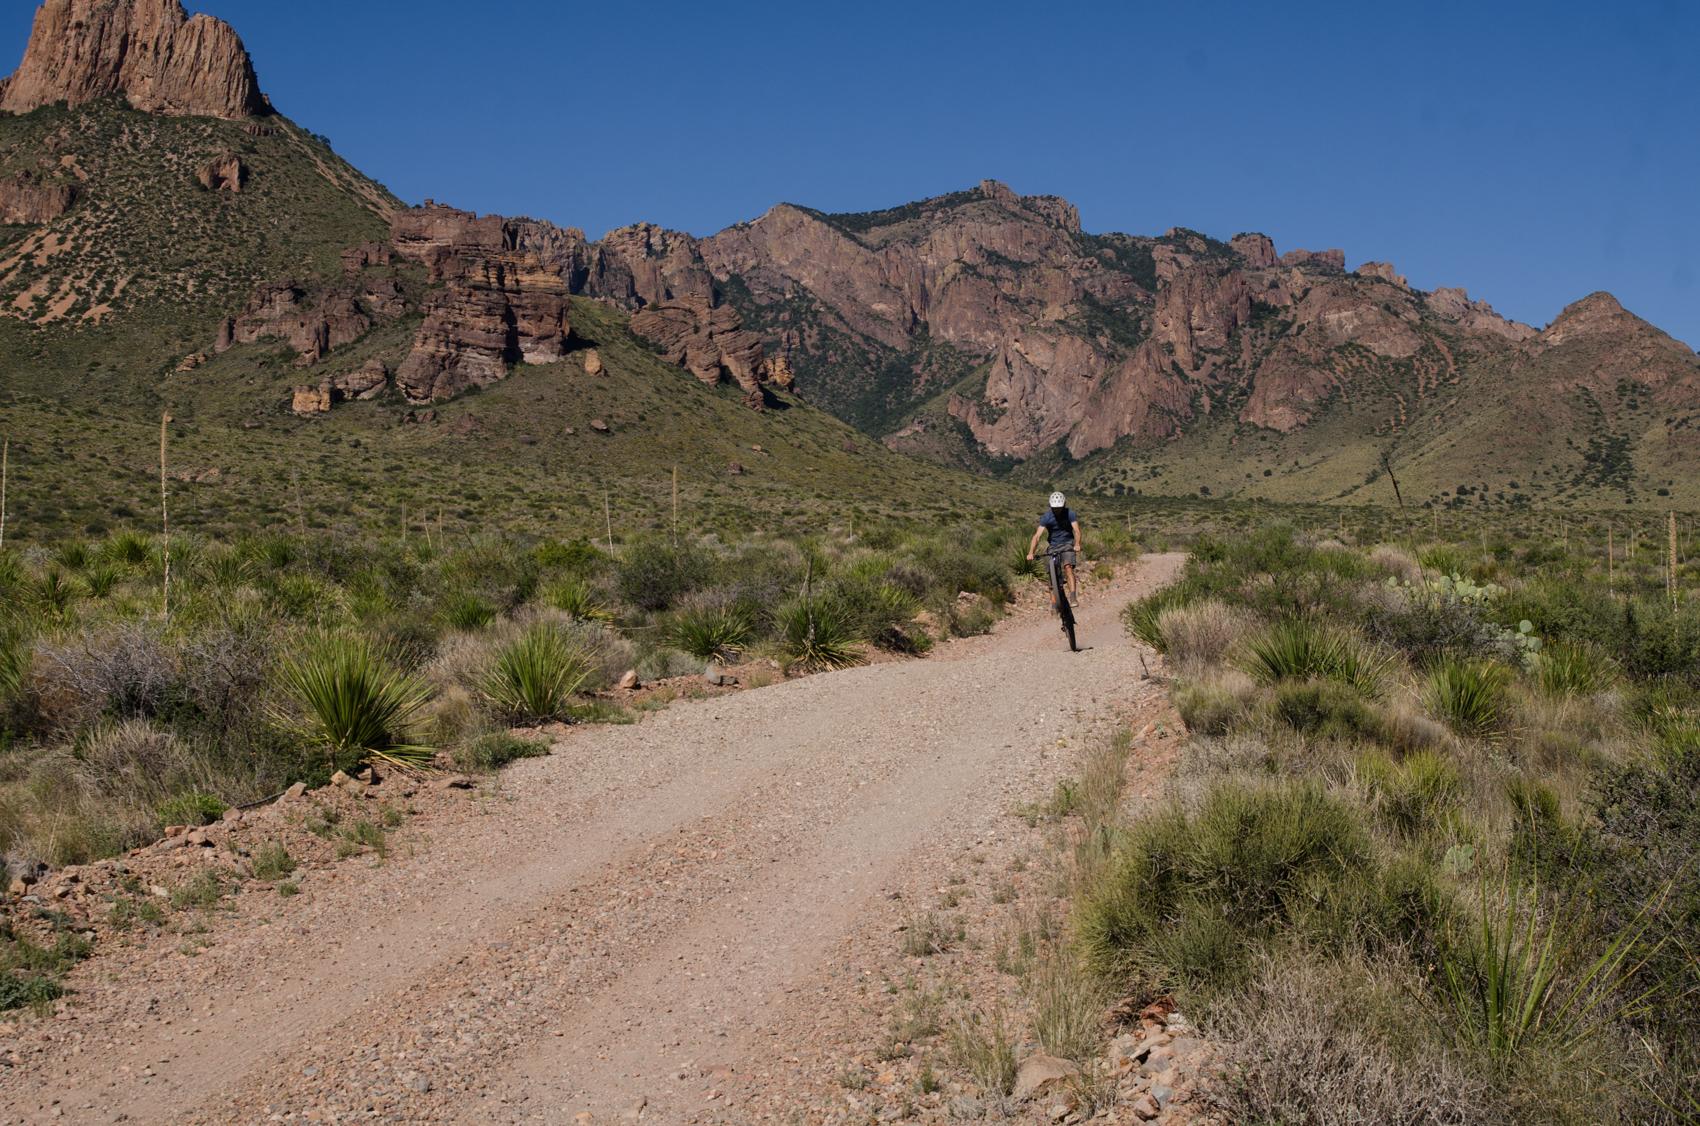 Mountain biking in big bend national park-leh cycling goods-21.jpg